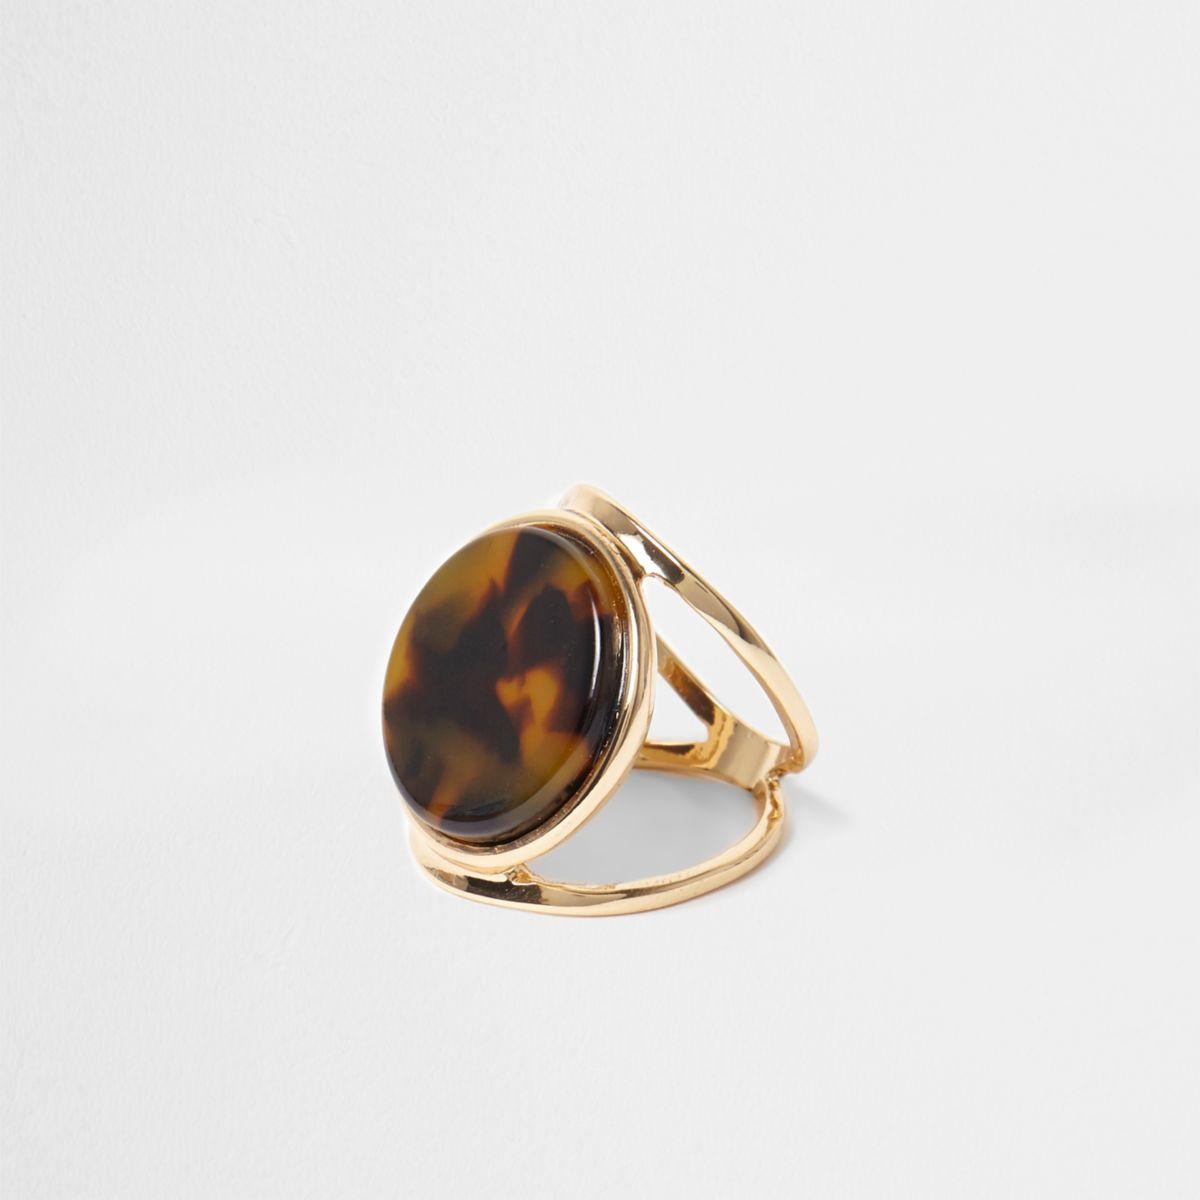 Gold tone tortoiseshell disc ring